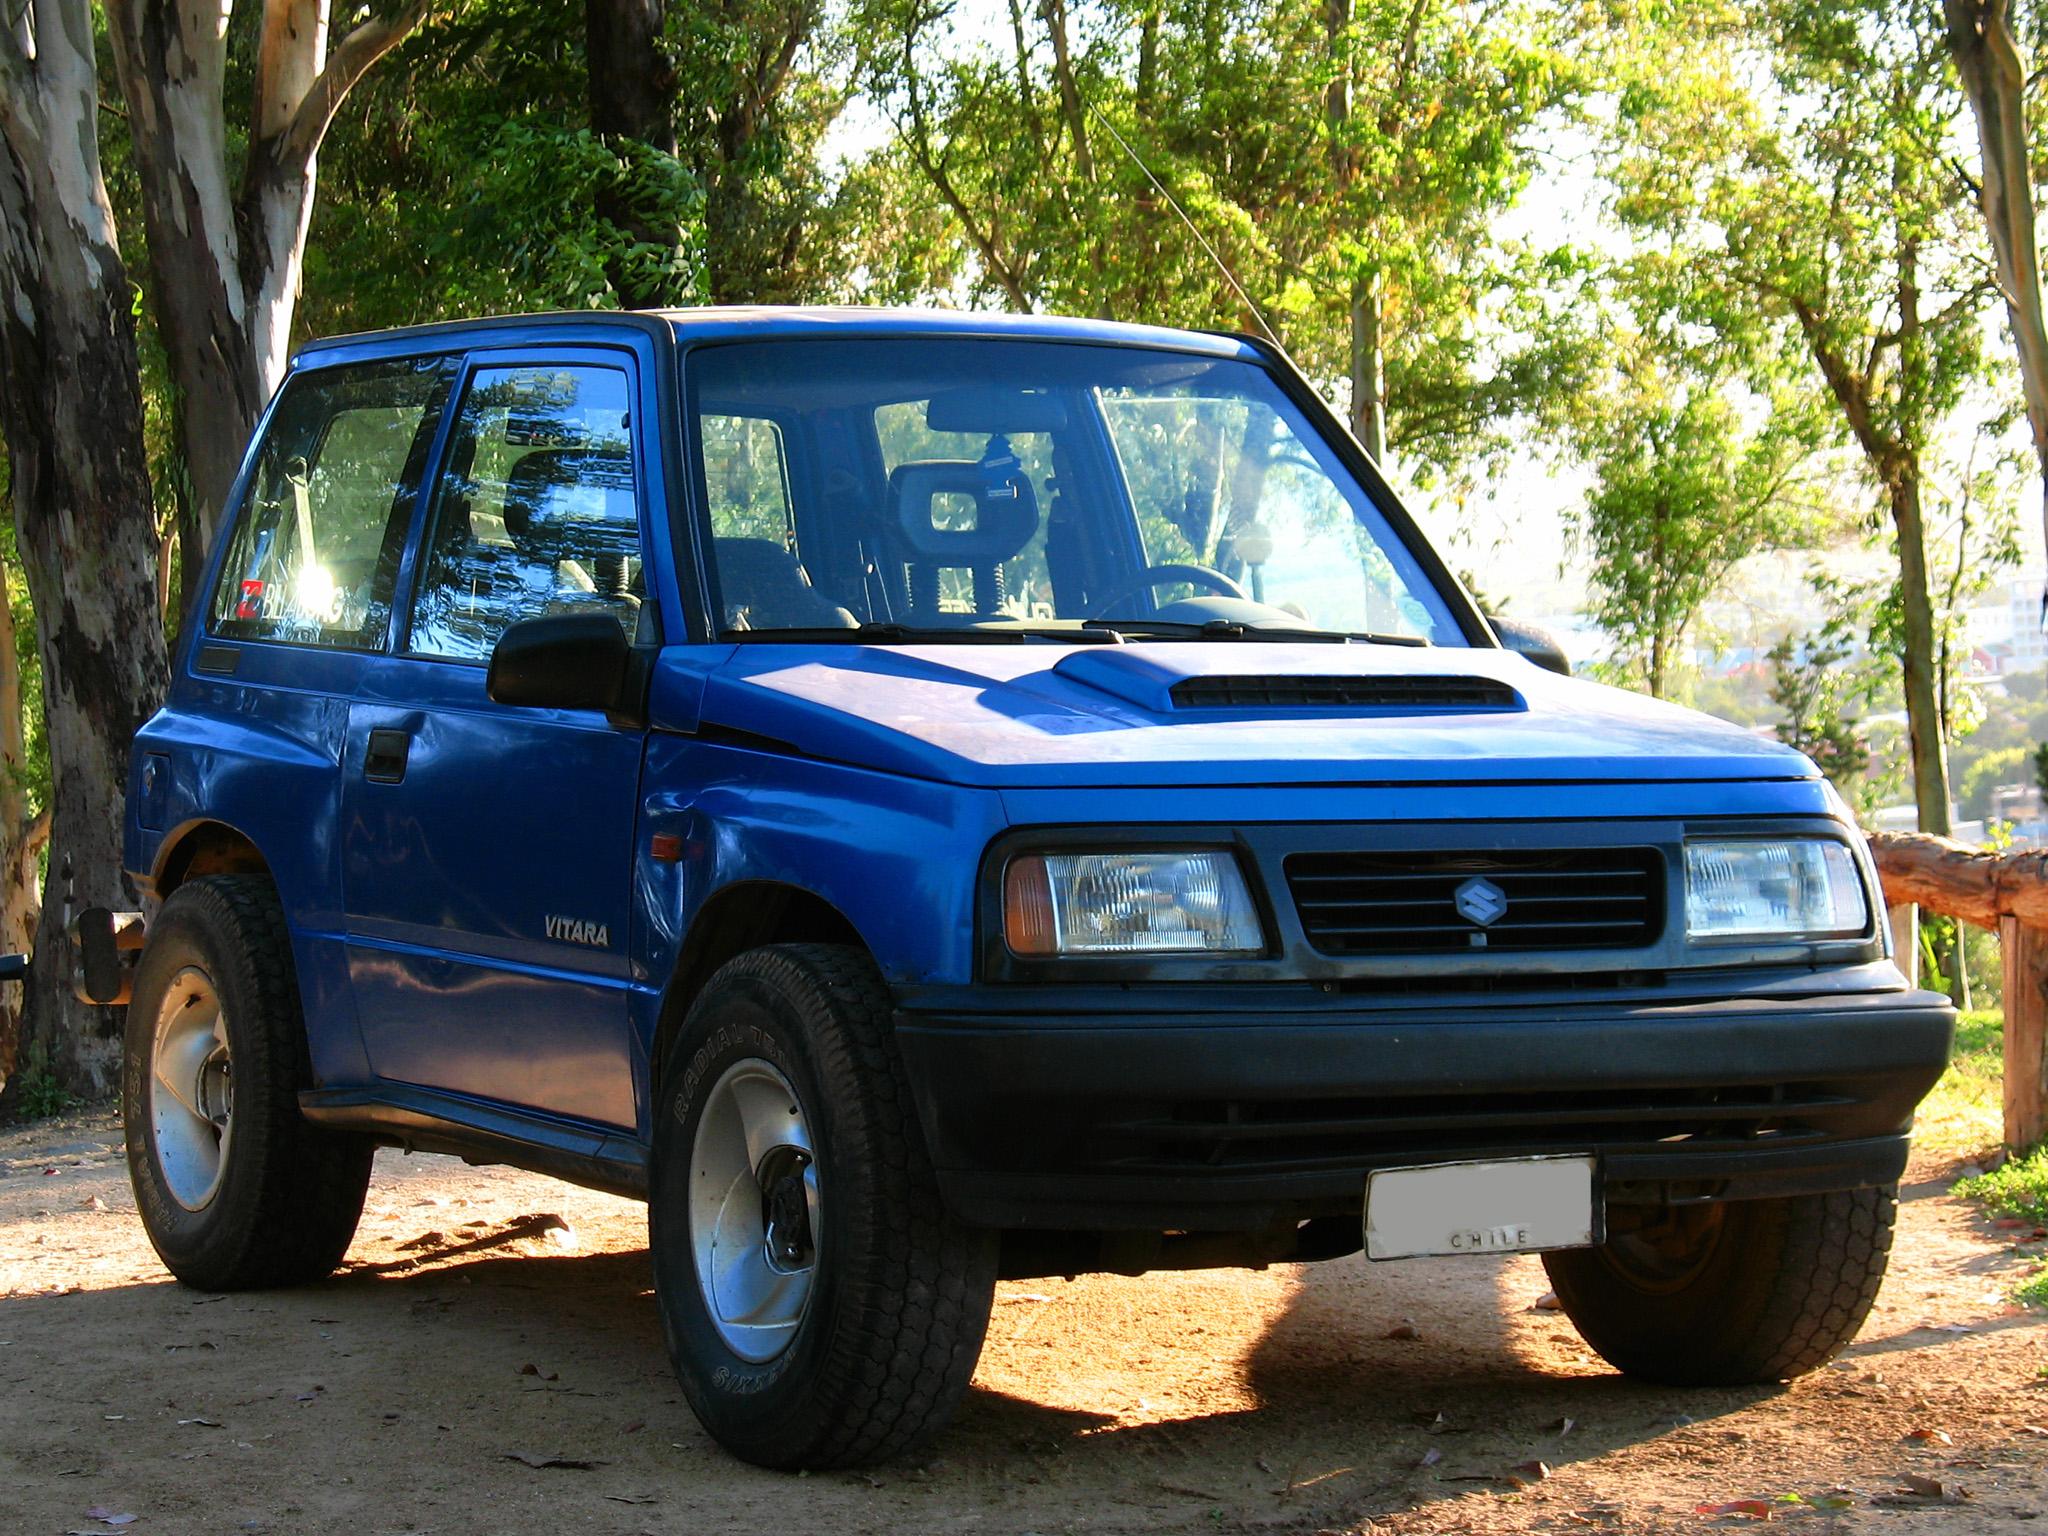 History Of Suzuki Vitara